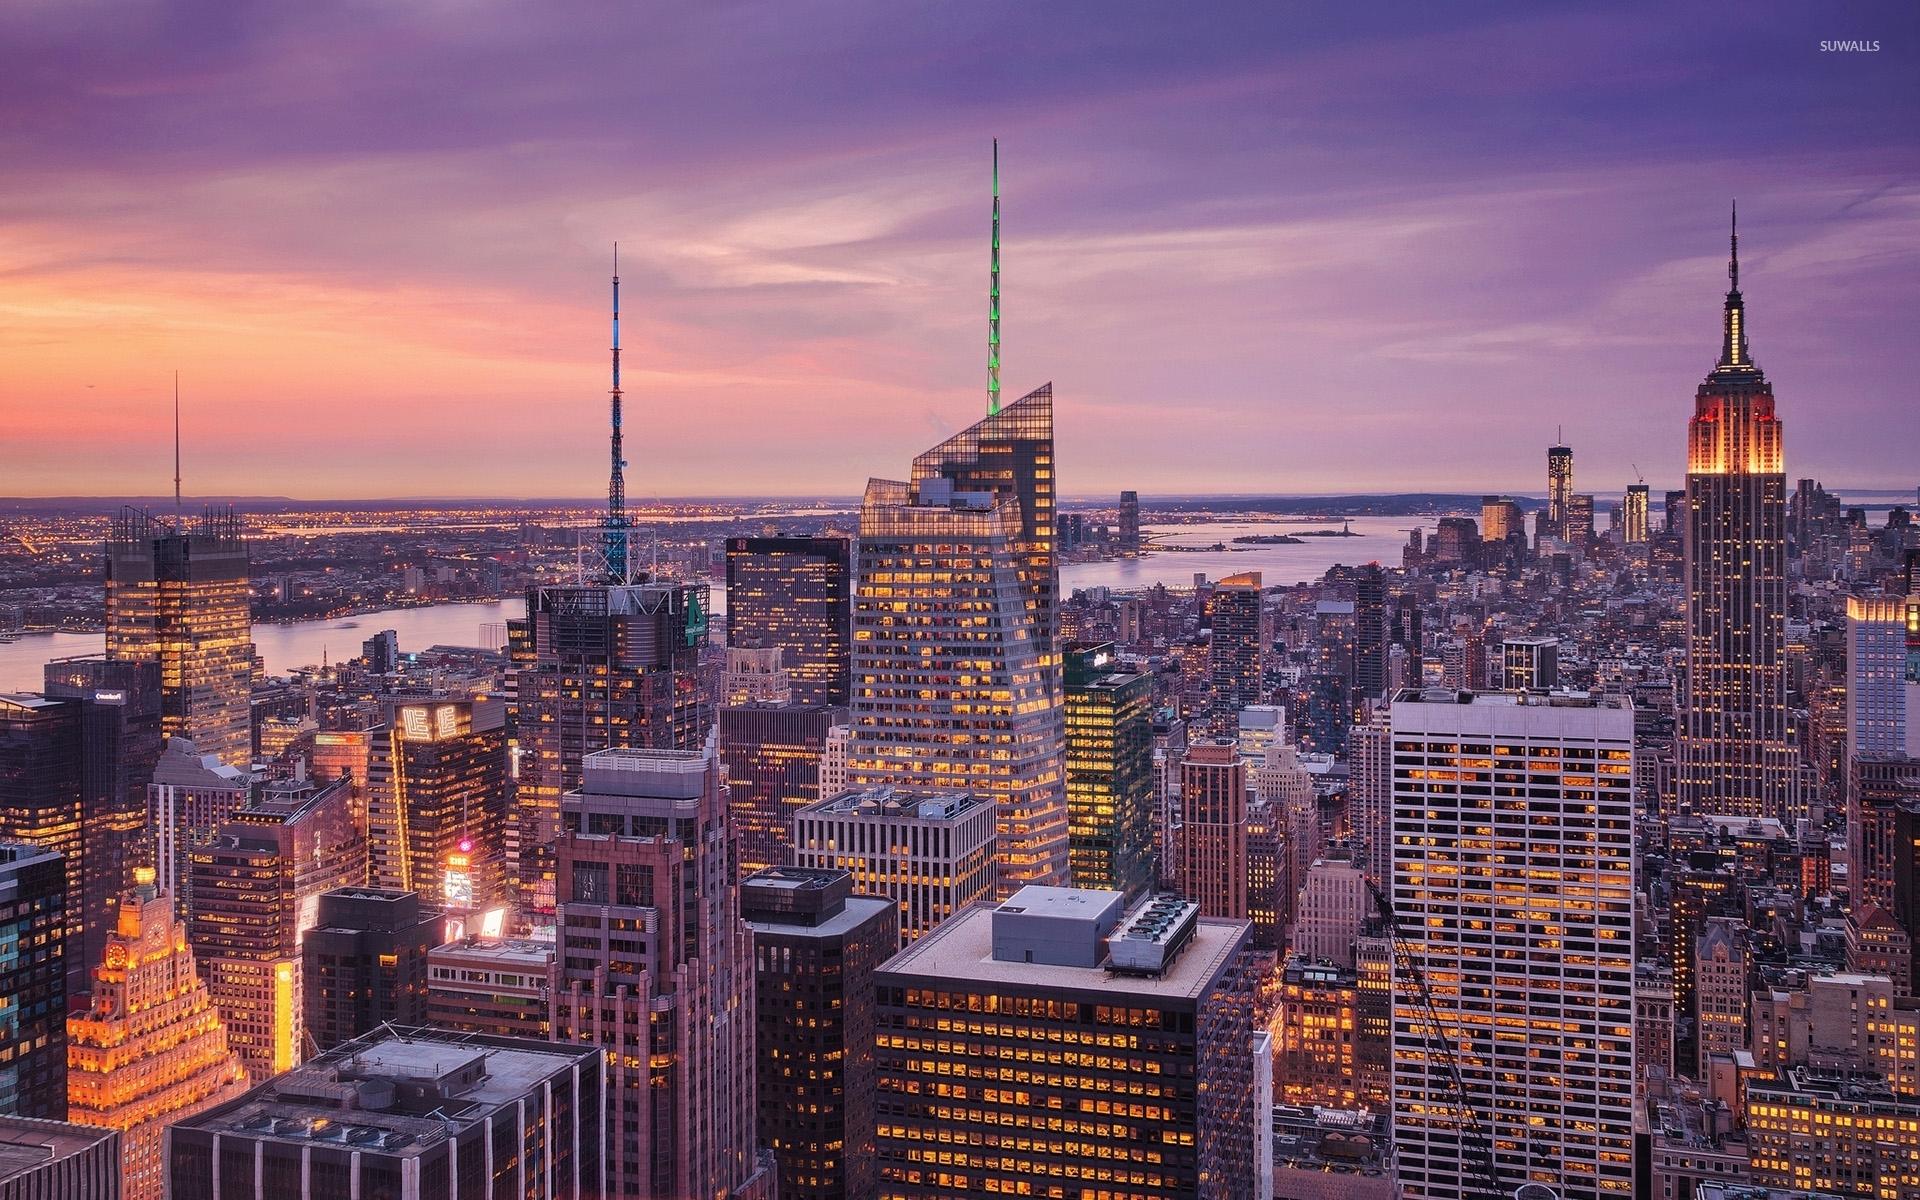 skyscrapers-in-new-york-city-50486-1920x1200.jpg